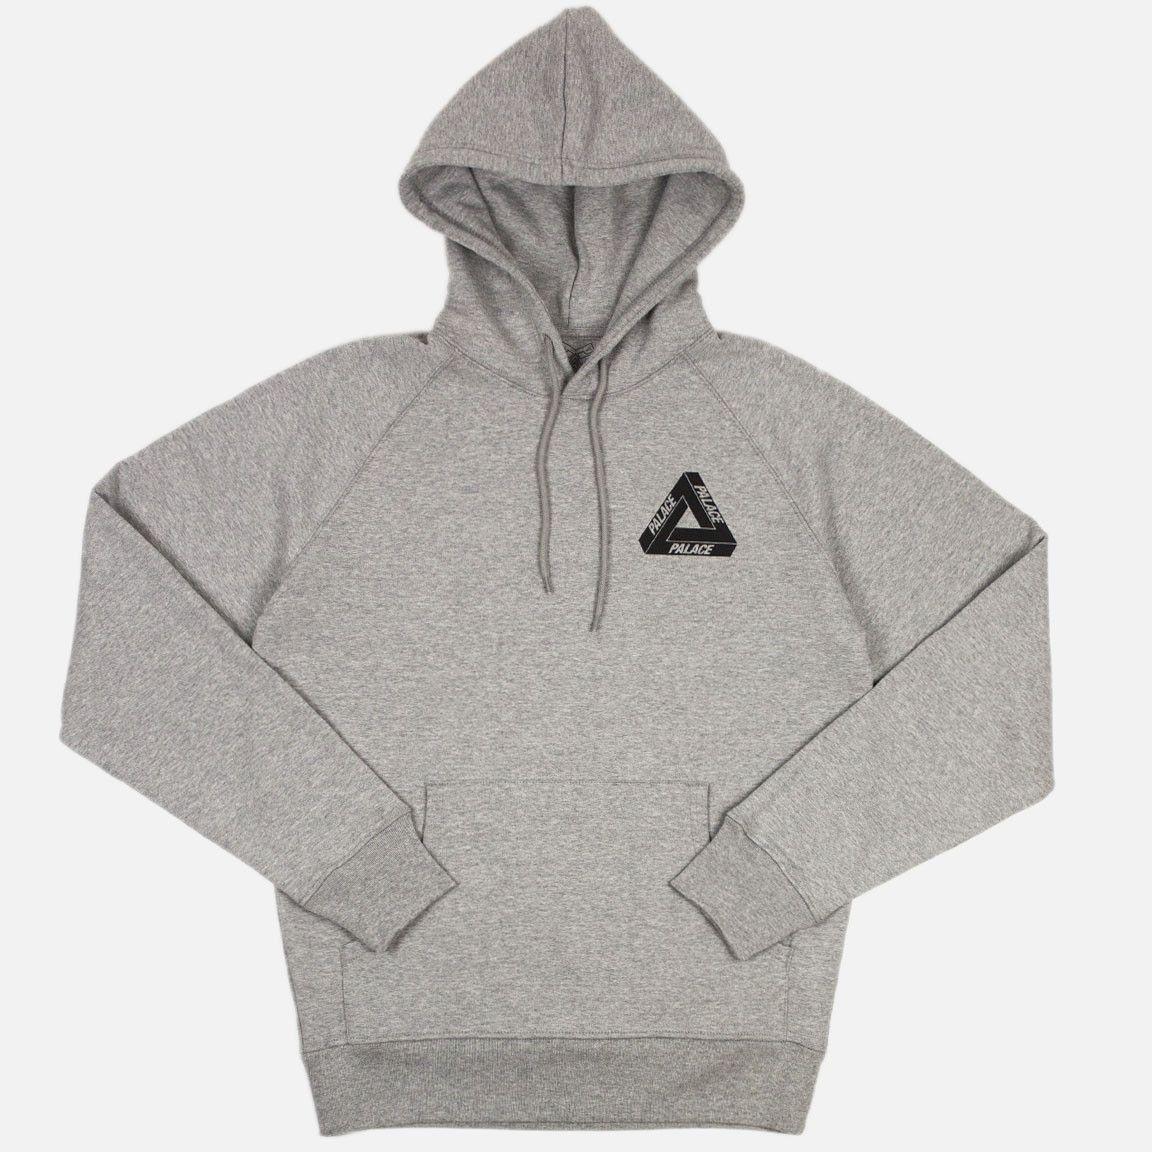 38686687 Palace Drury Yard Hooded Sweatshirt - Grey | Clothing | Grey ...